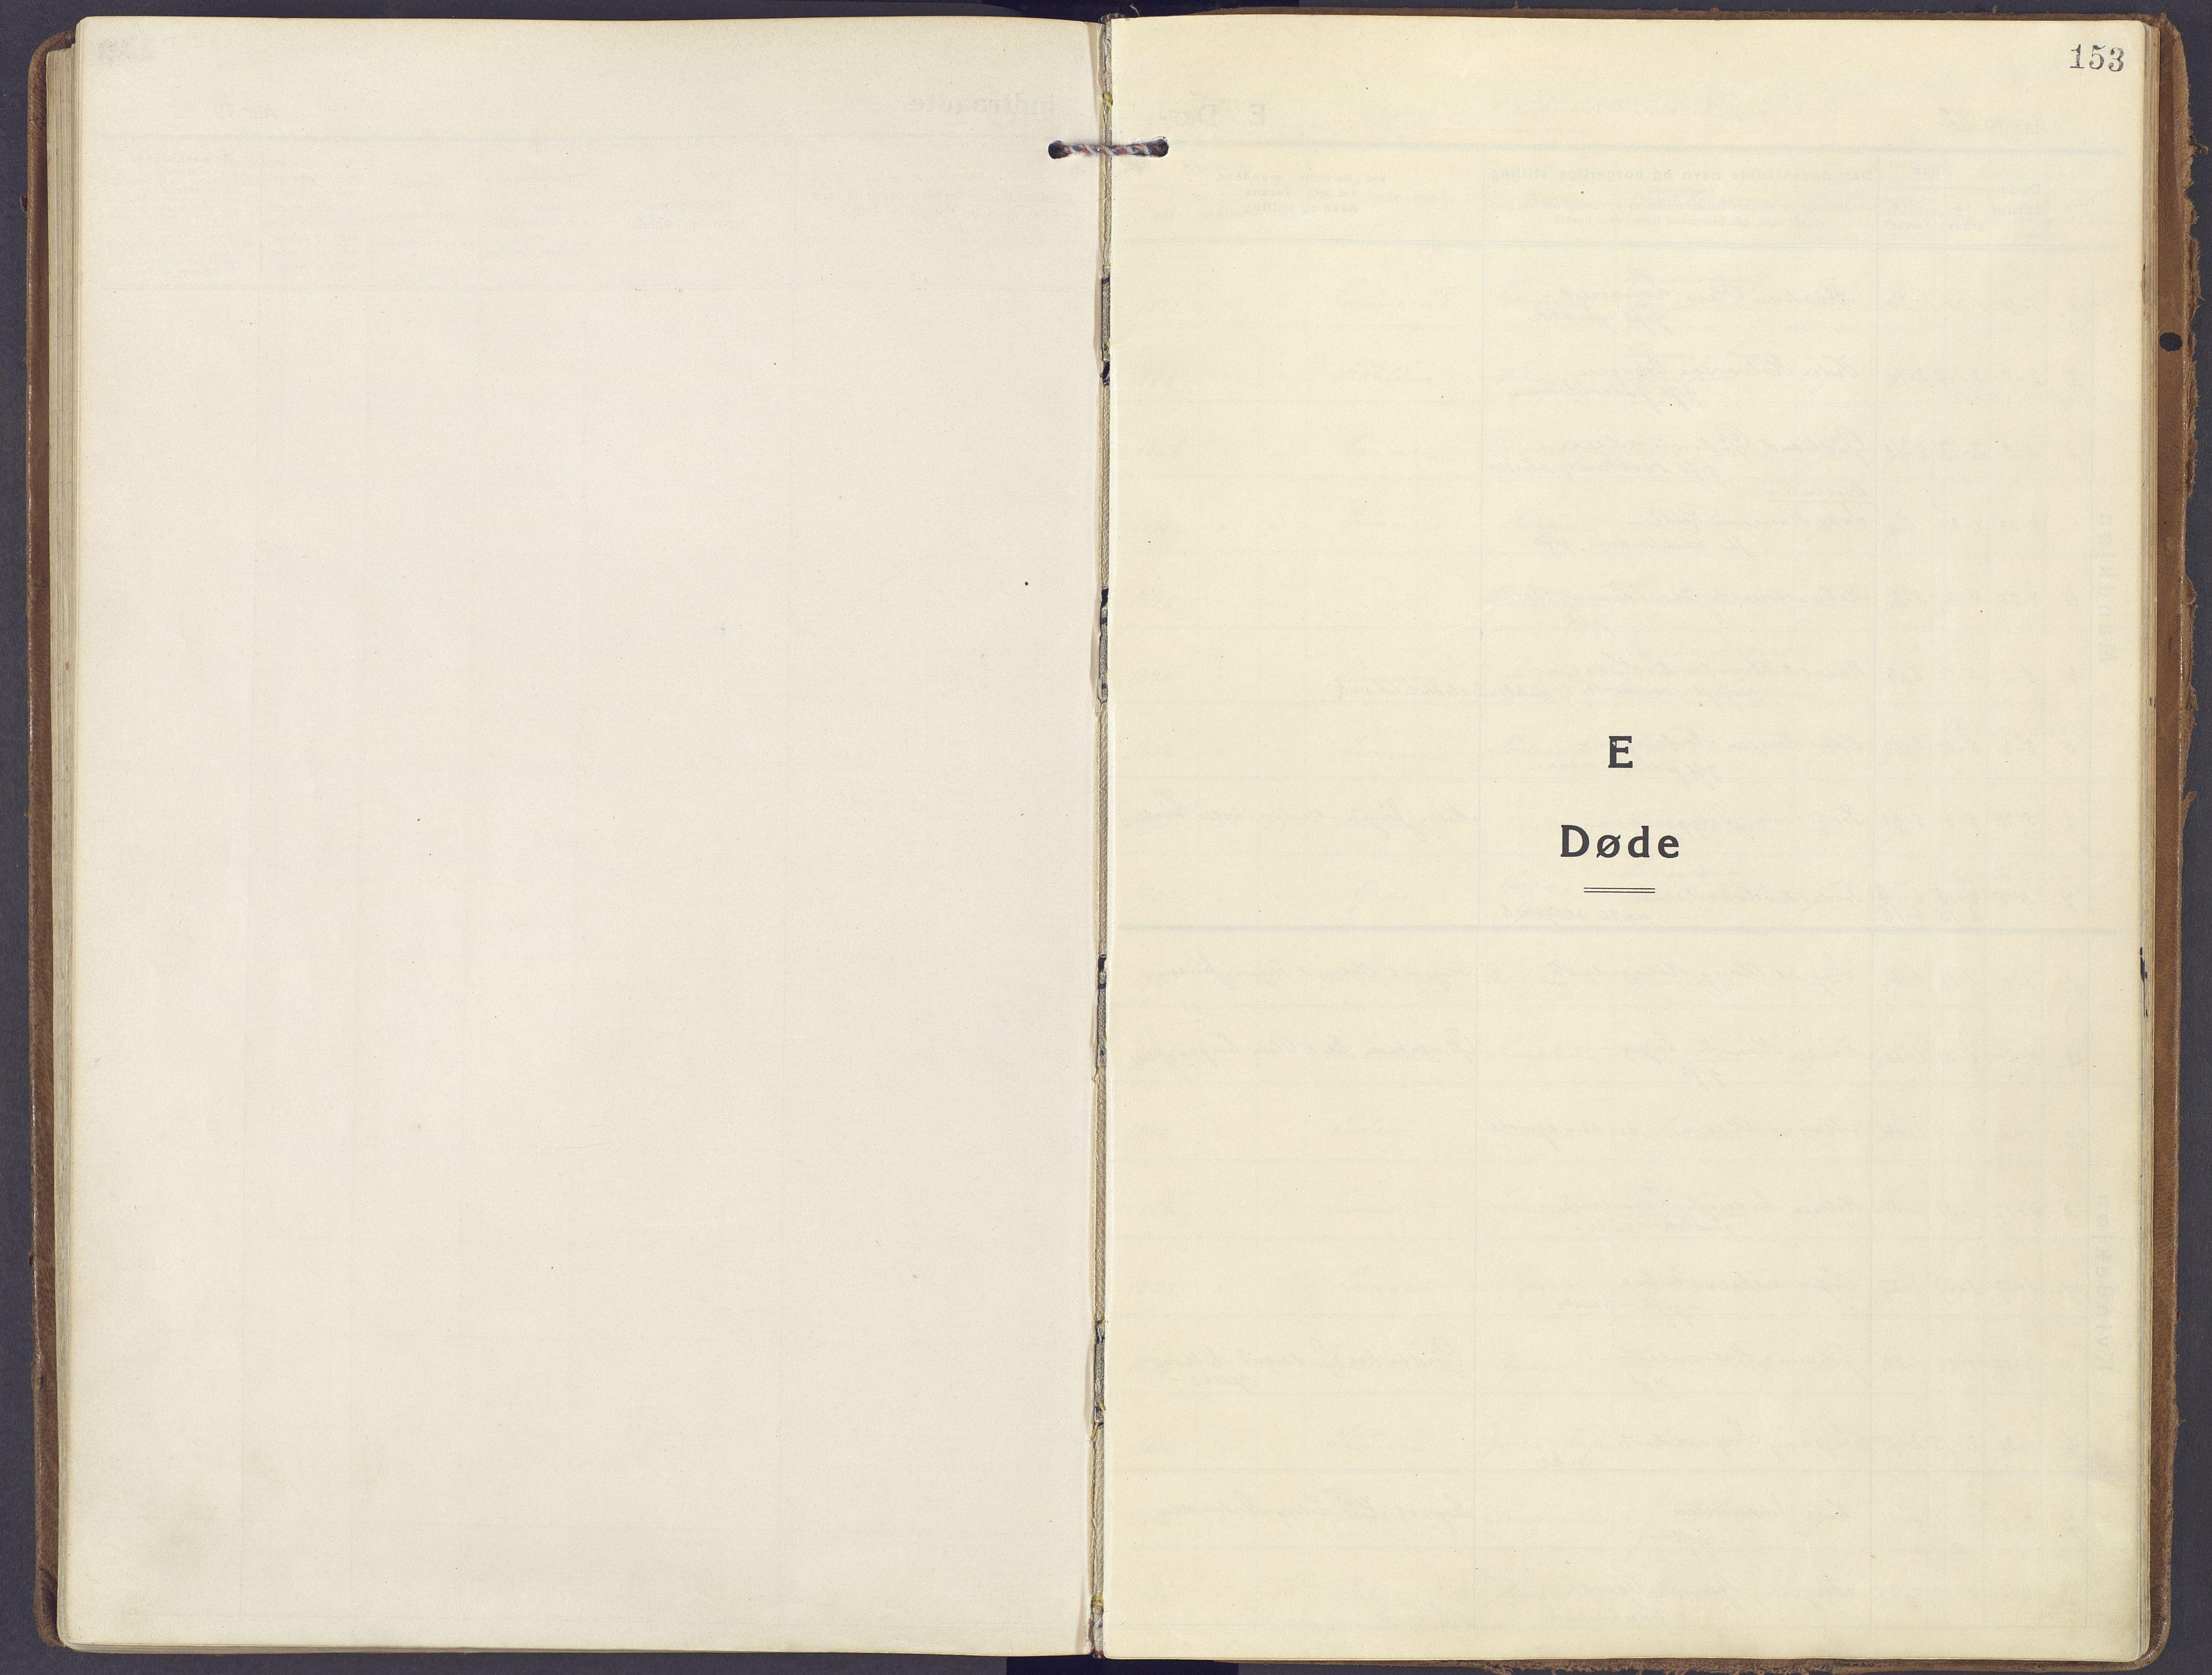 SAH, Lunner prestekontor, H/Ha/Haa/L0002: Ministerialbok nr. 2, 1922-1931, s. 153